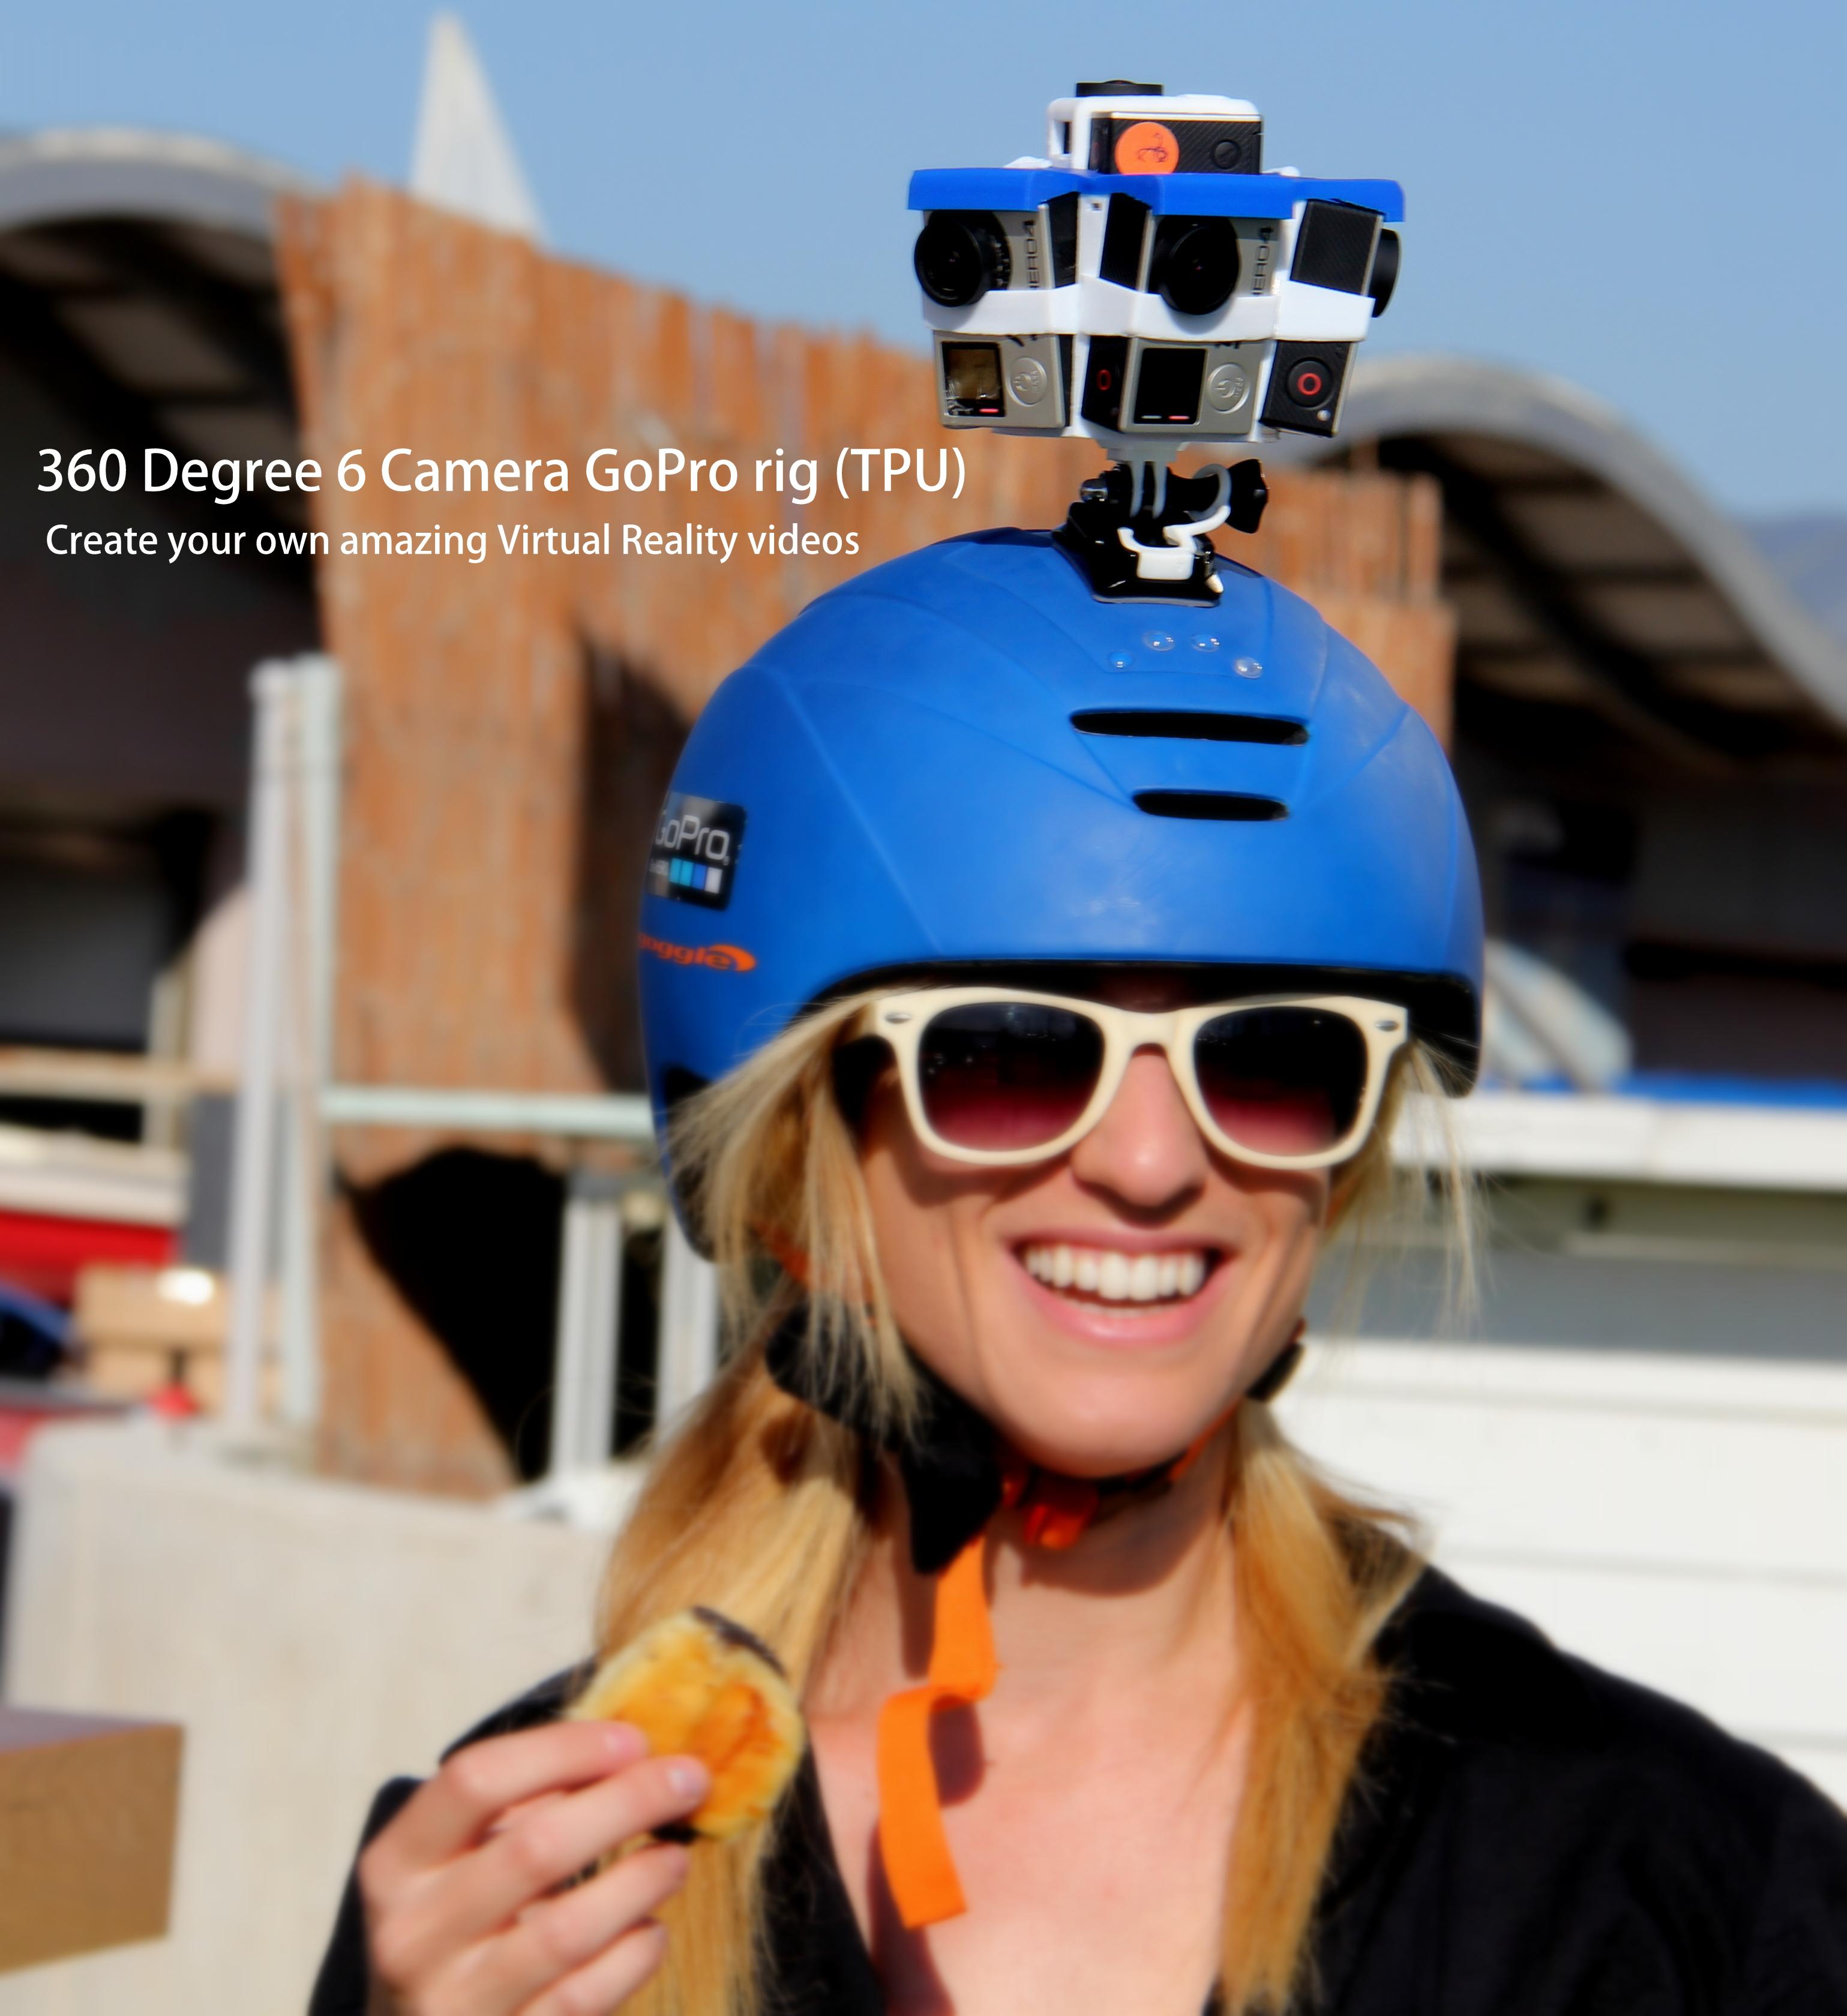 360 degree vr gopro rig